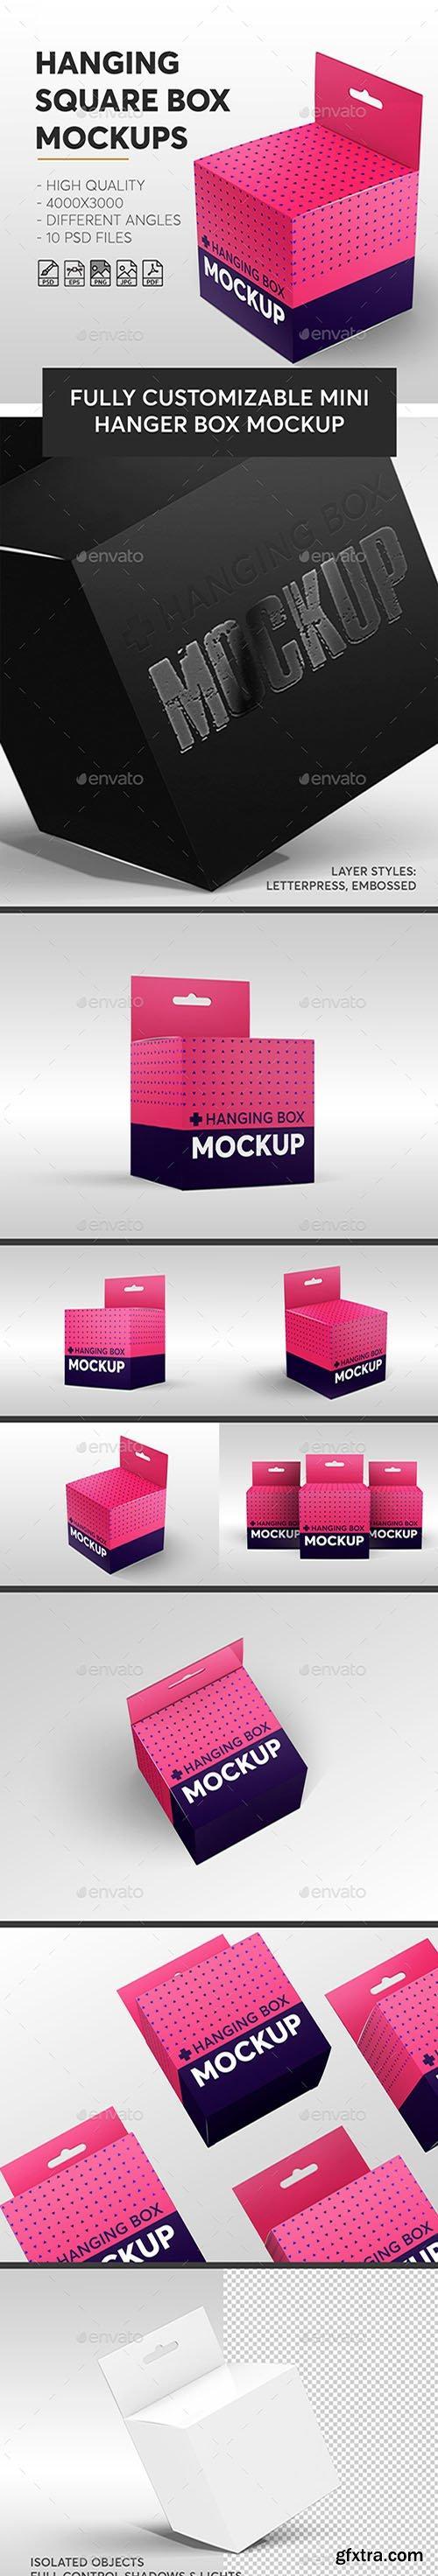 Hanging Square Box Mockups V.1 | Miscellaneous 23078385